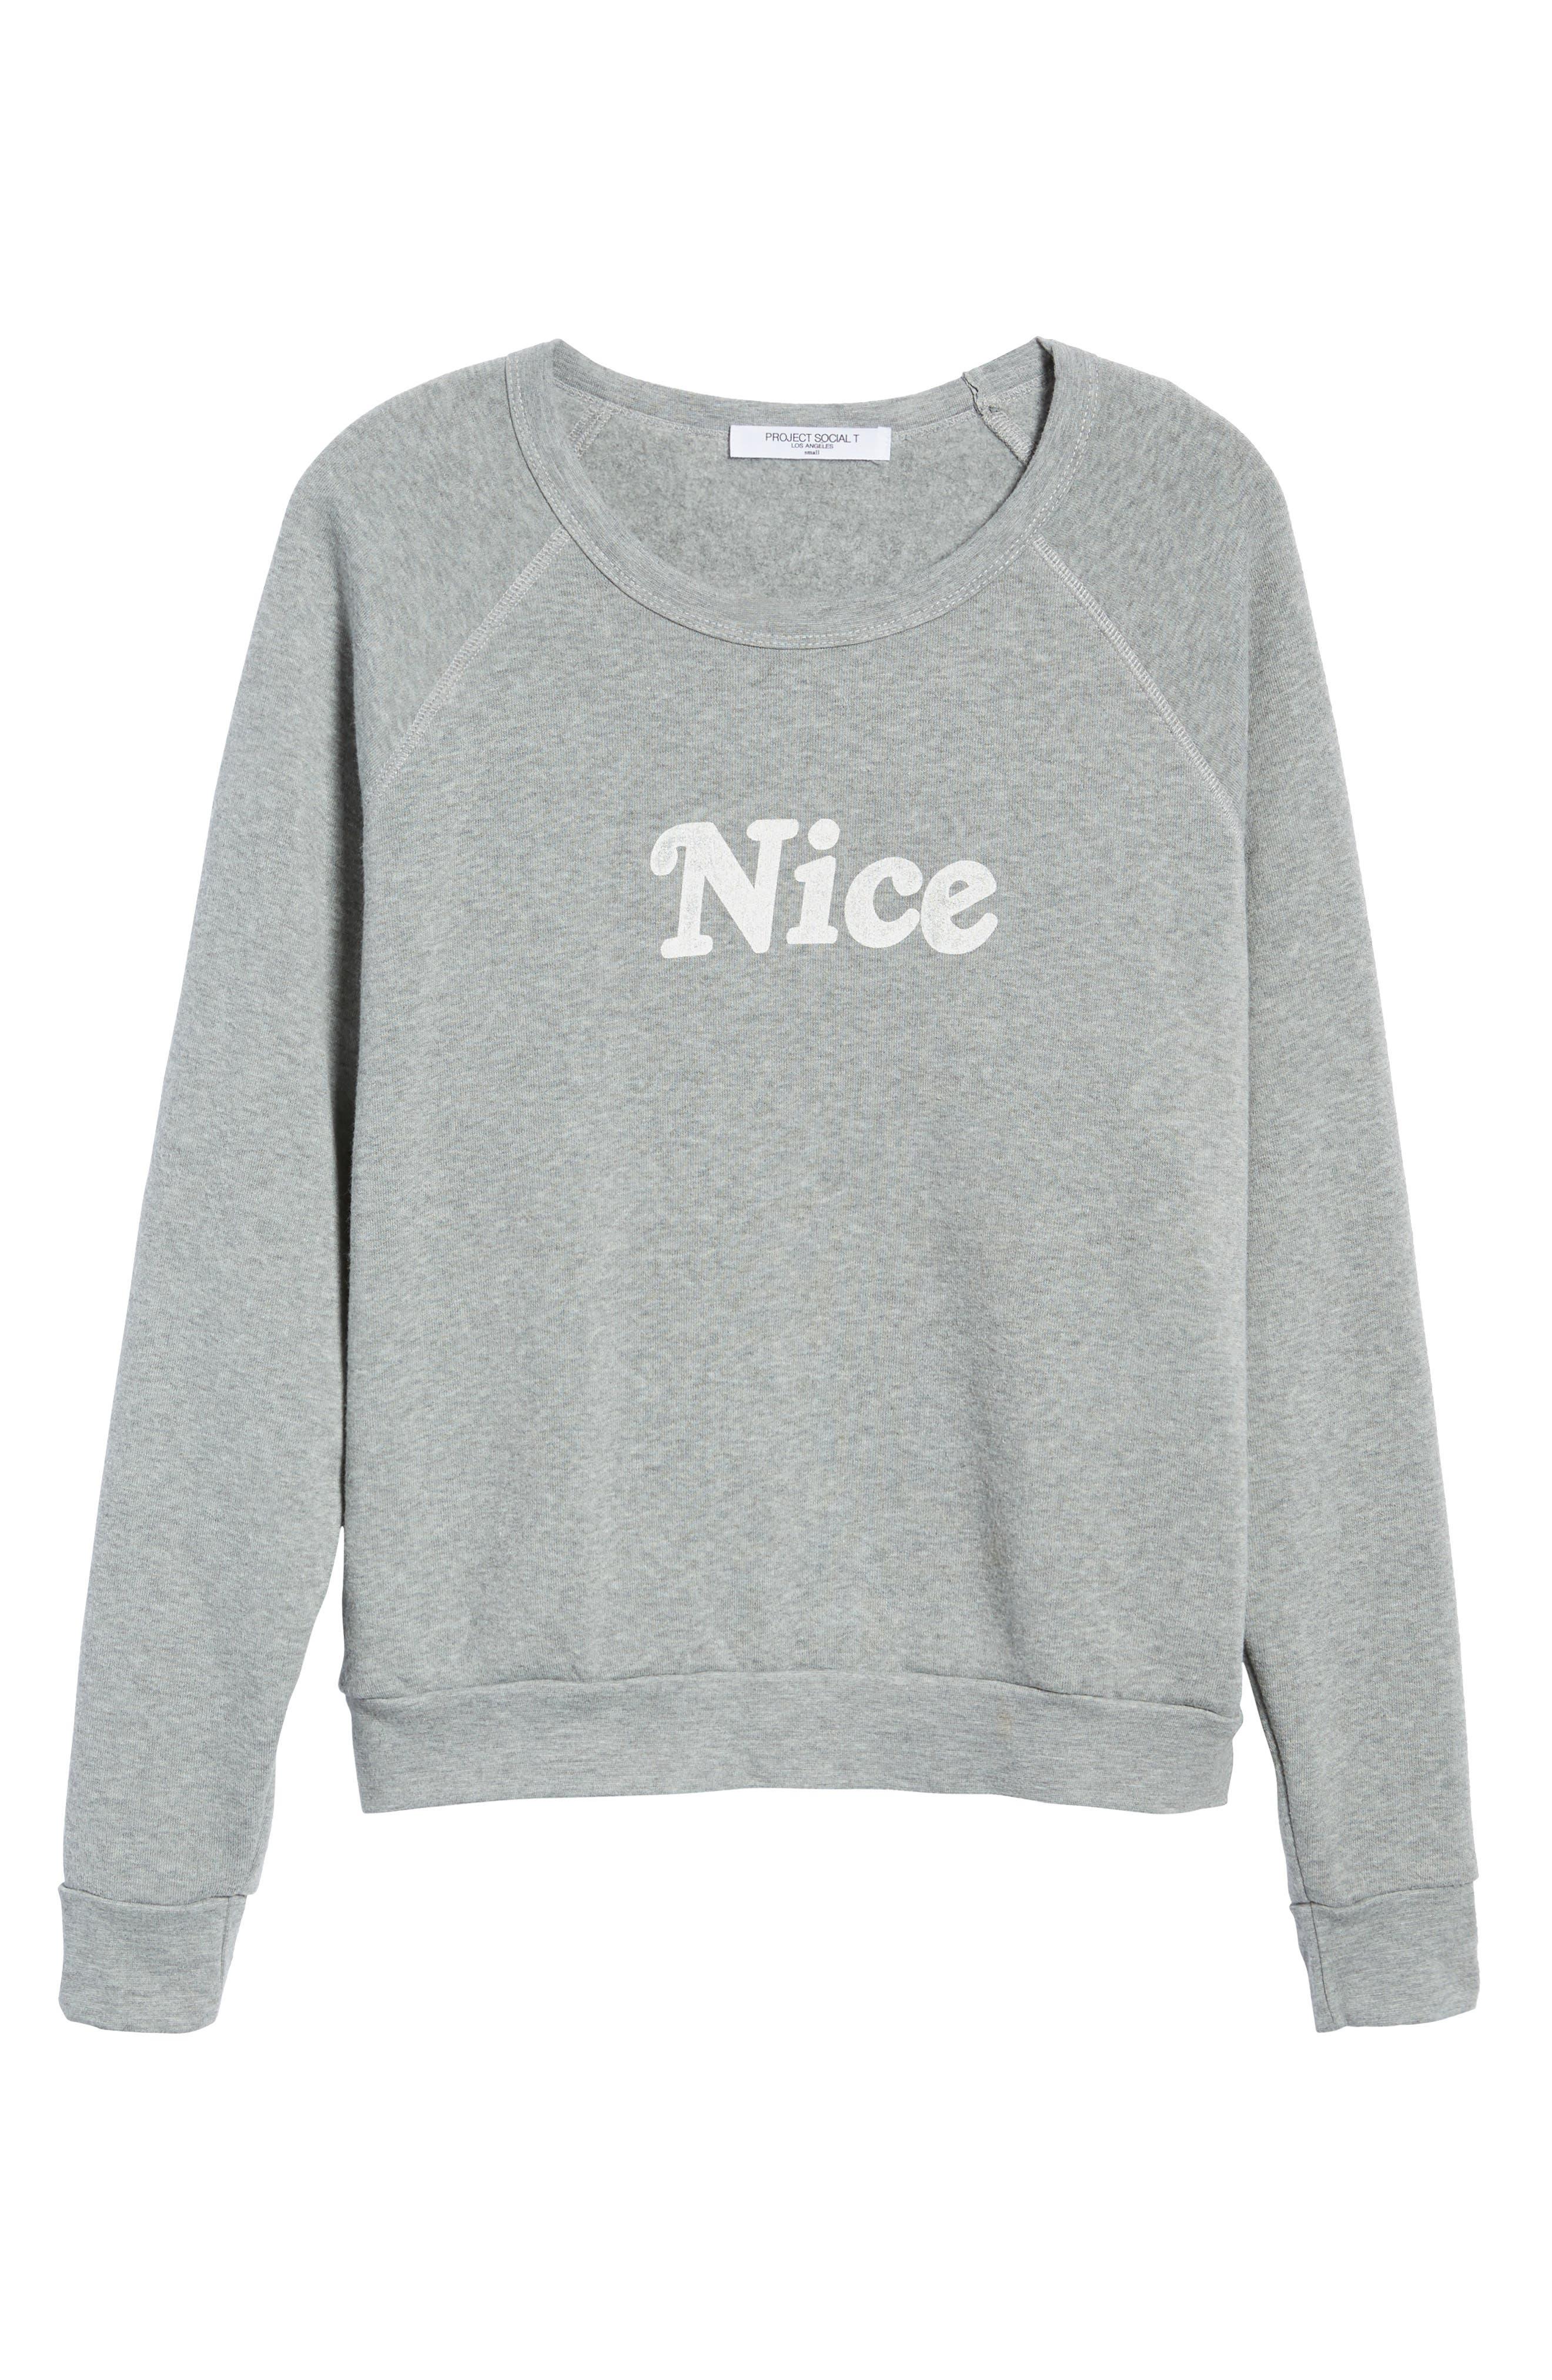 Naughty/Nice Reversible Sweatshirt,                             Alternate thumbnail 7, color,                             HEATHER GREY